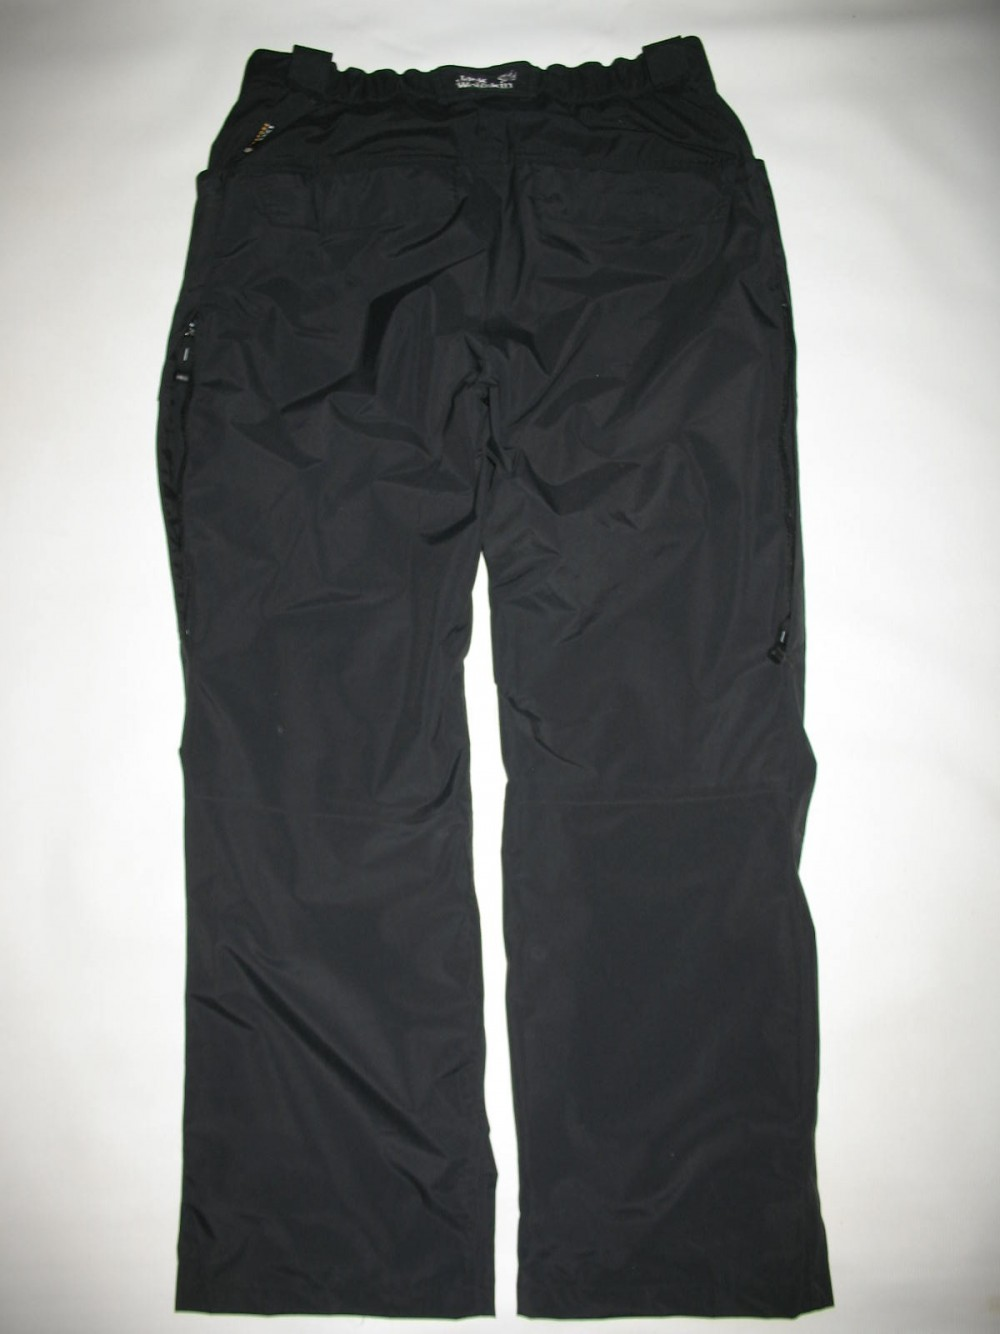 Штаны JACK WOLFSKIN texapore pants (размер M) - 2